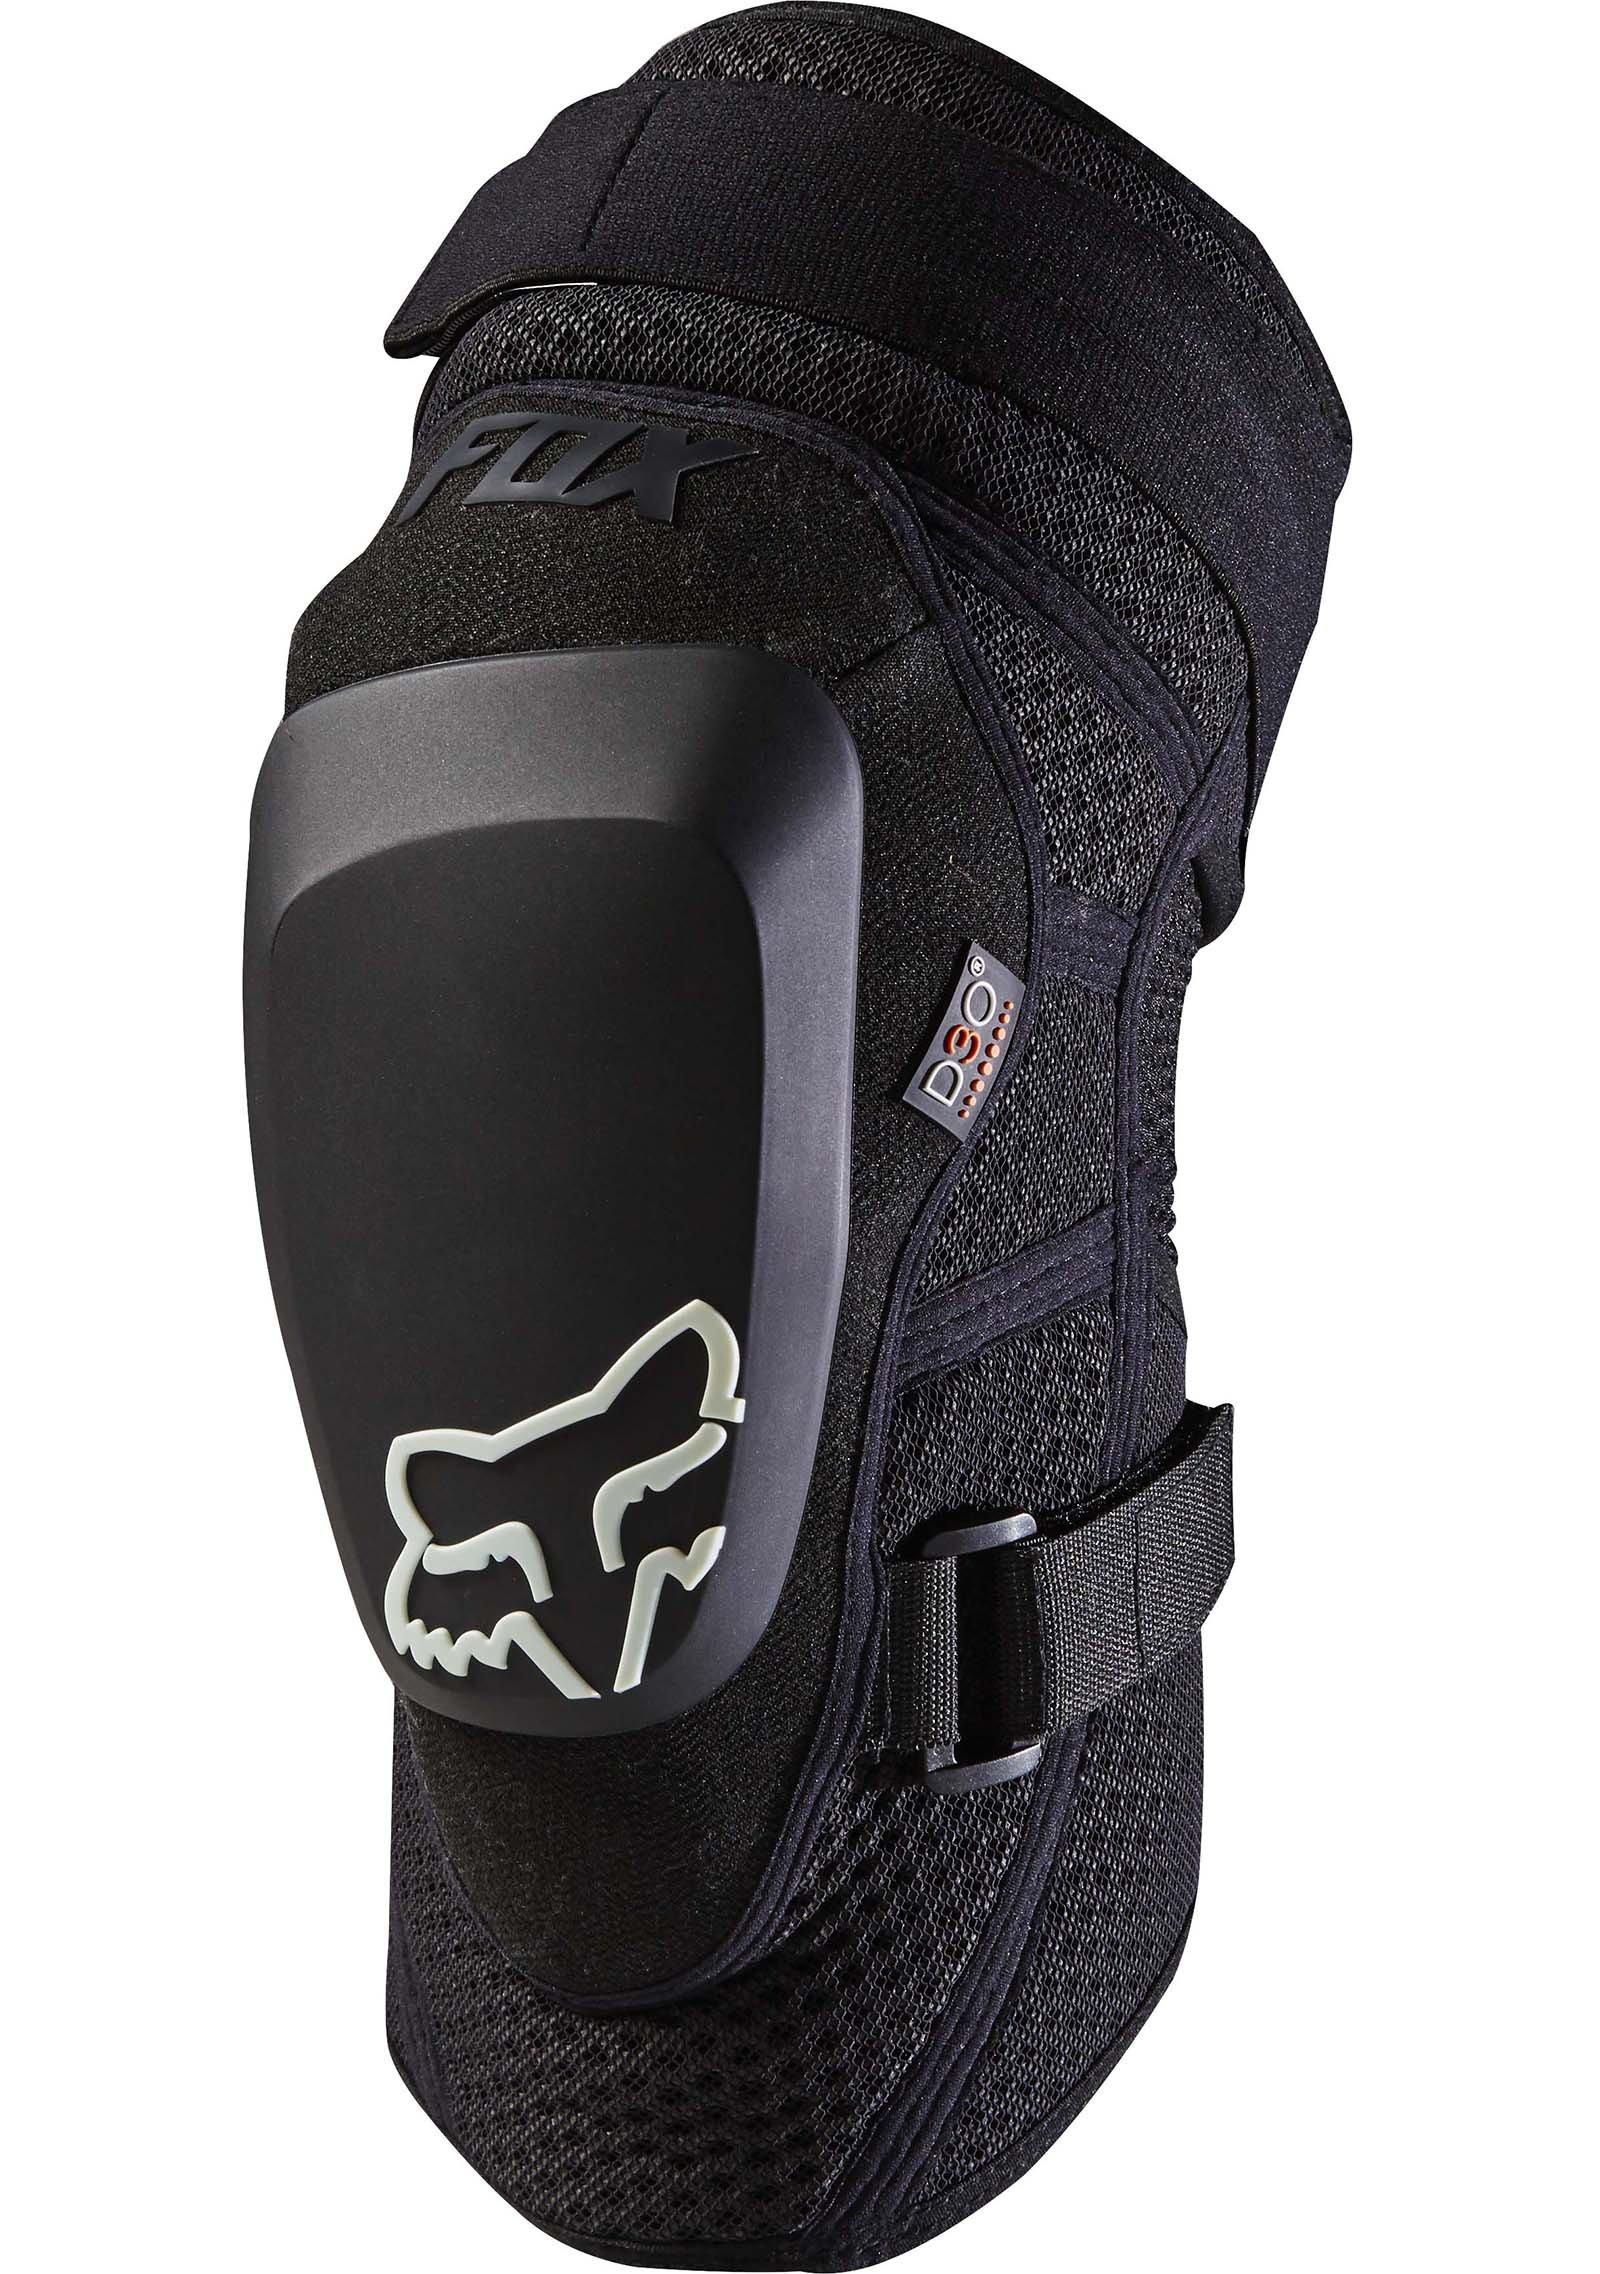 Fox Racing Launch Pro D3O Knee Guard Black, S